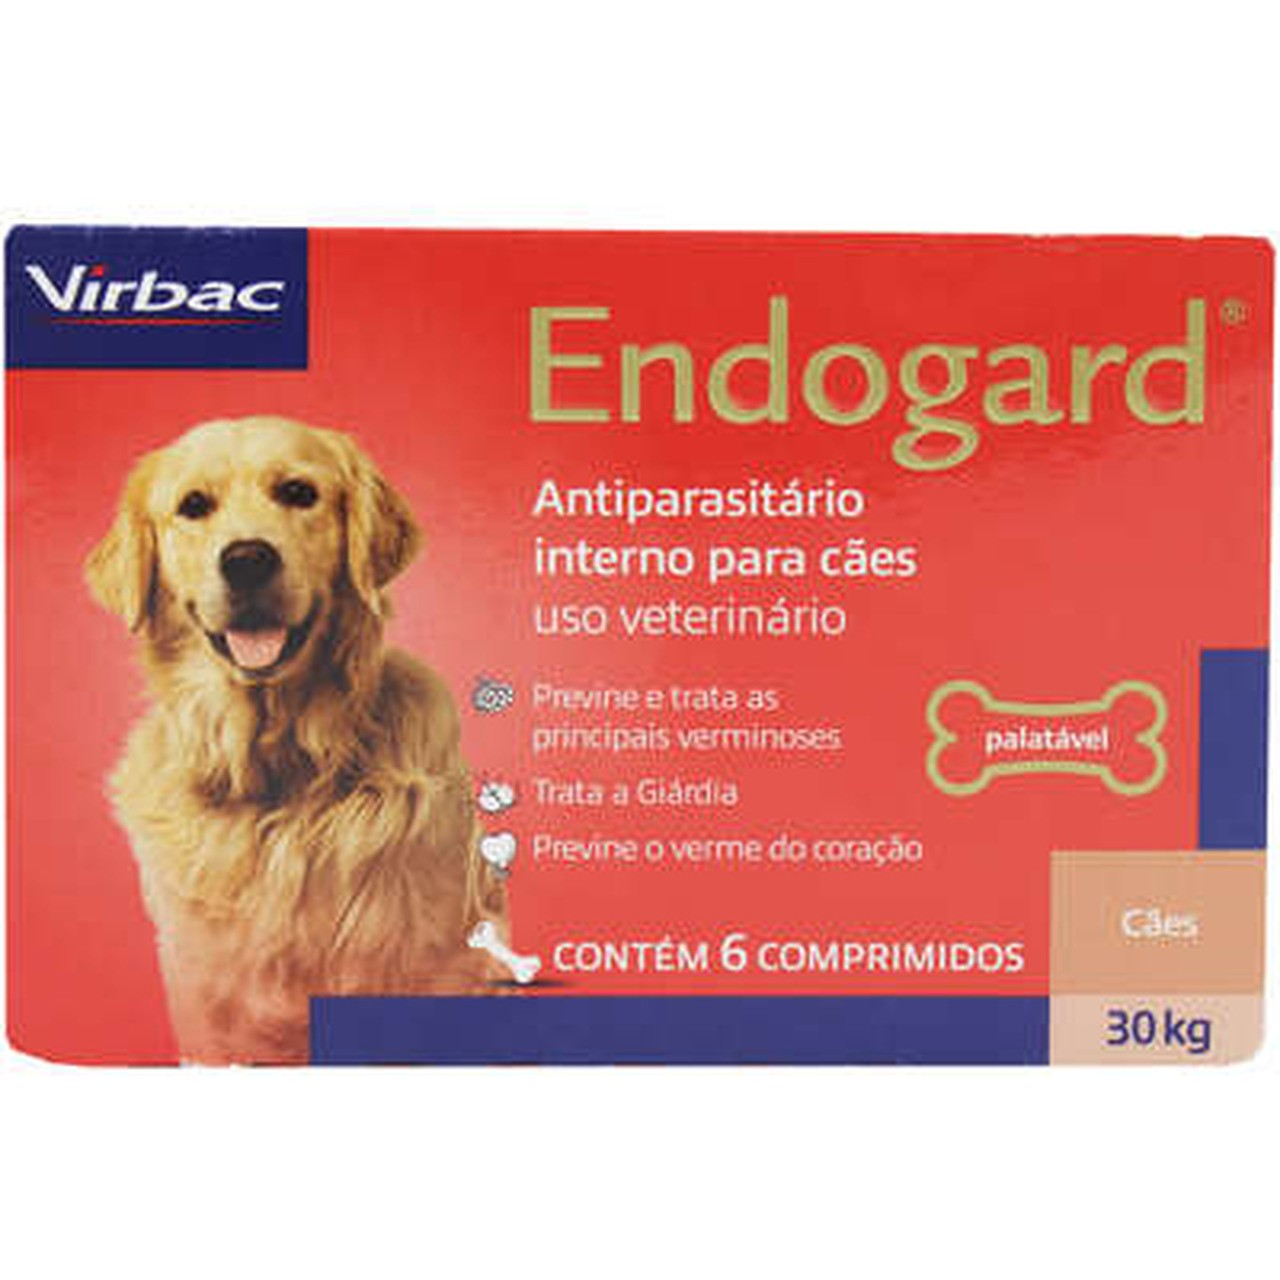 Vermifugo Endogard Virbac